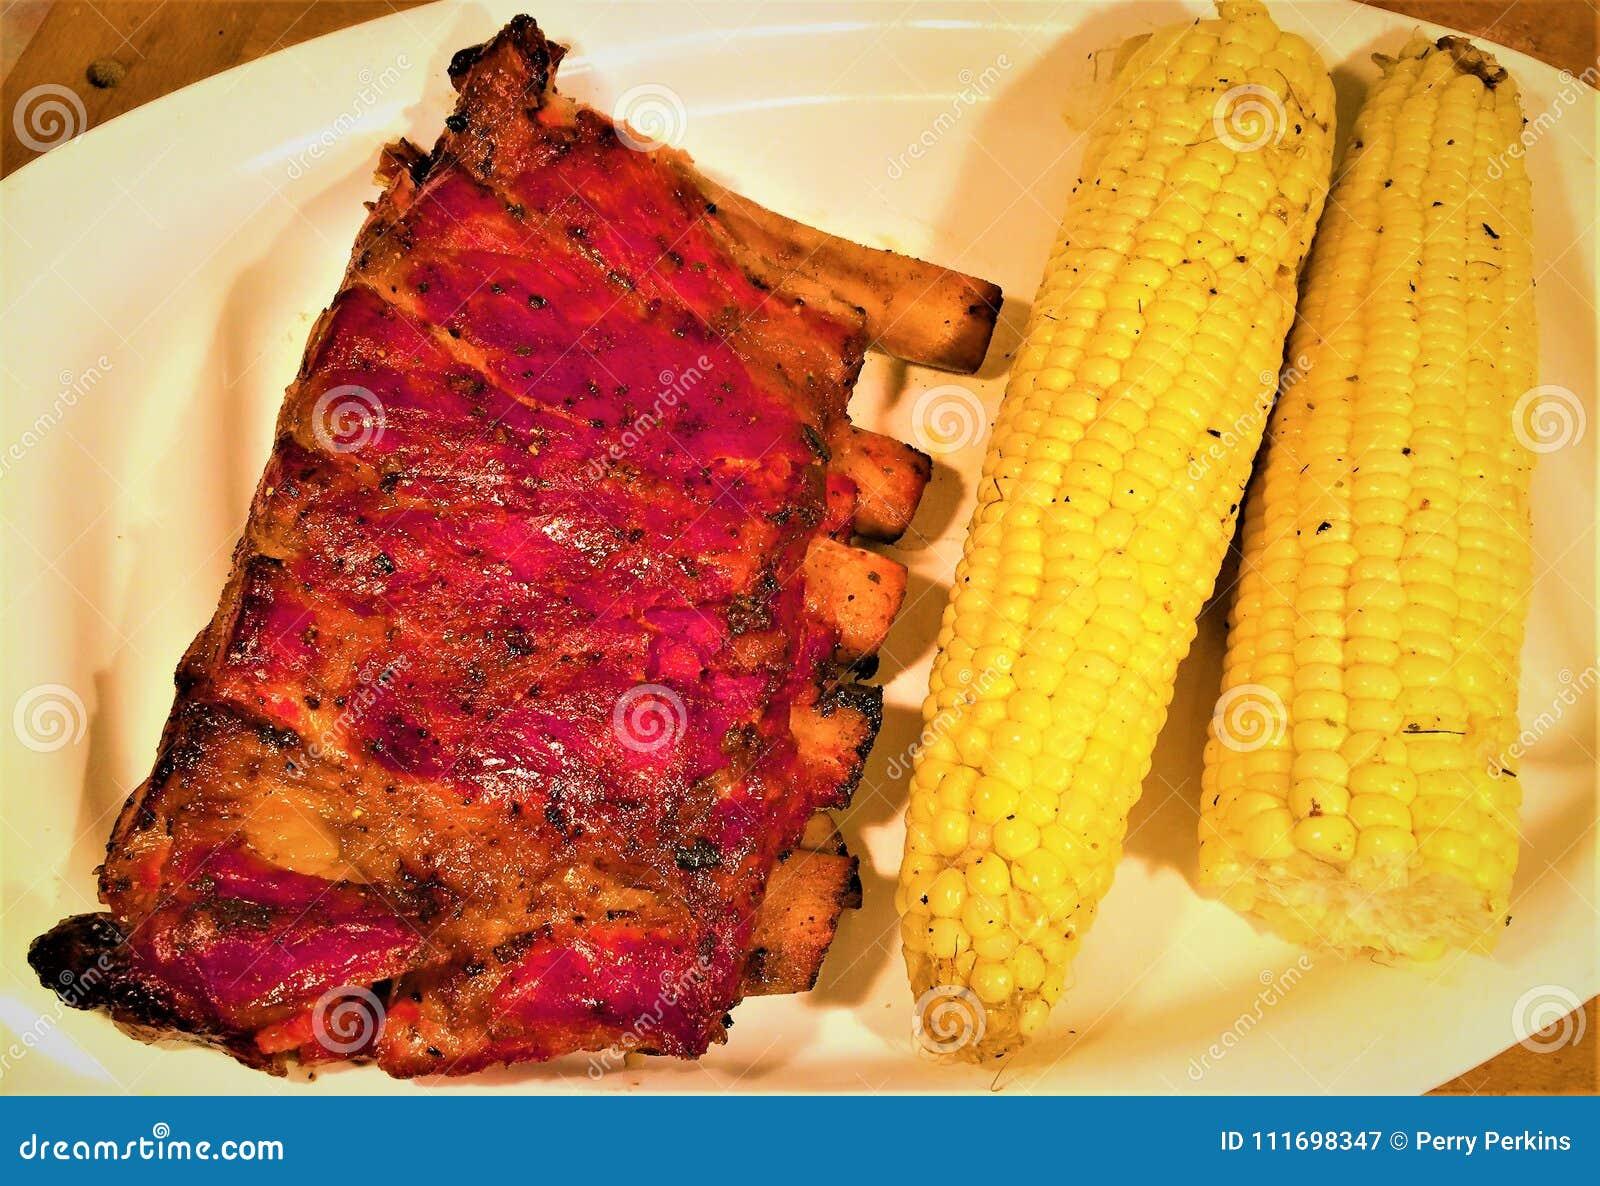 St Louis Smoked Pork Spareribs